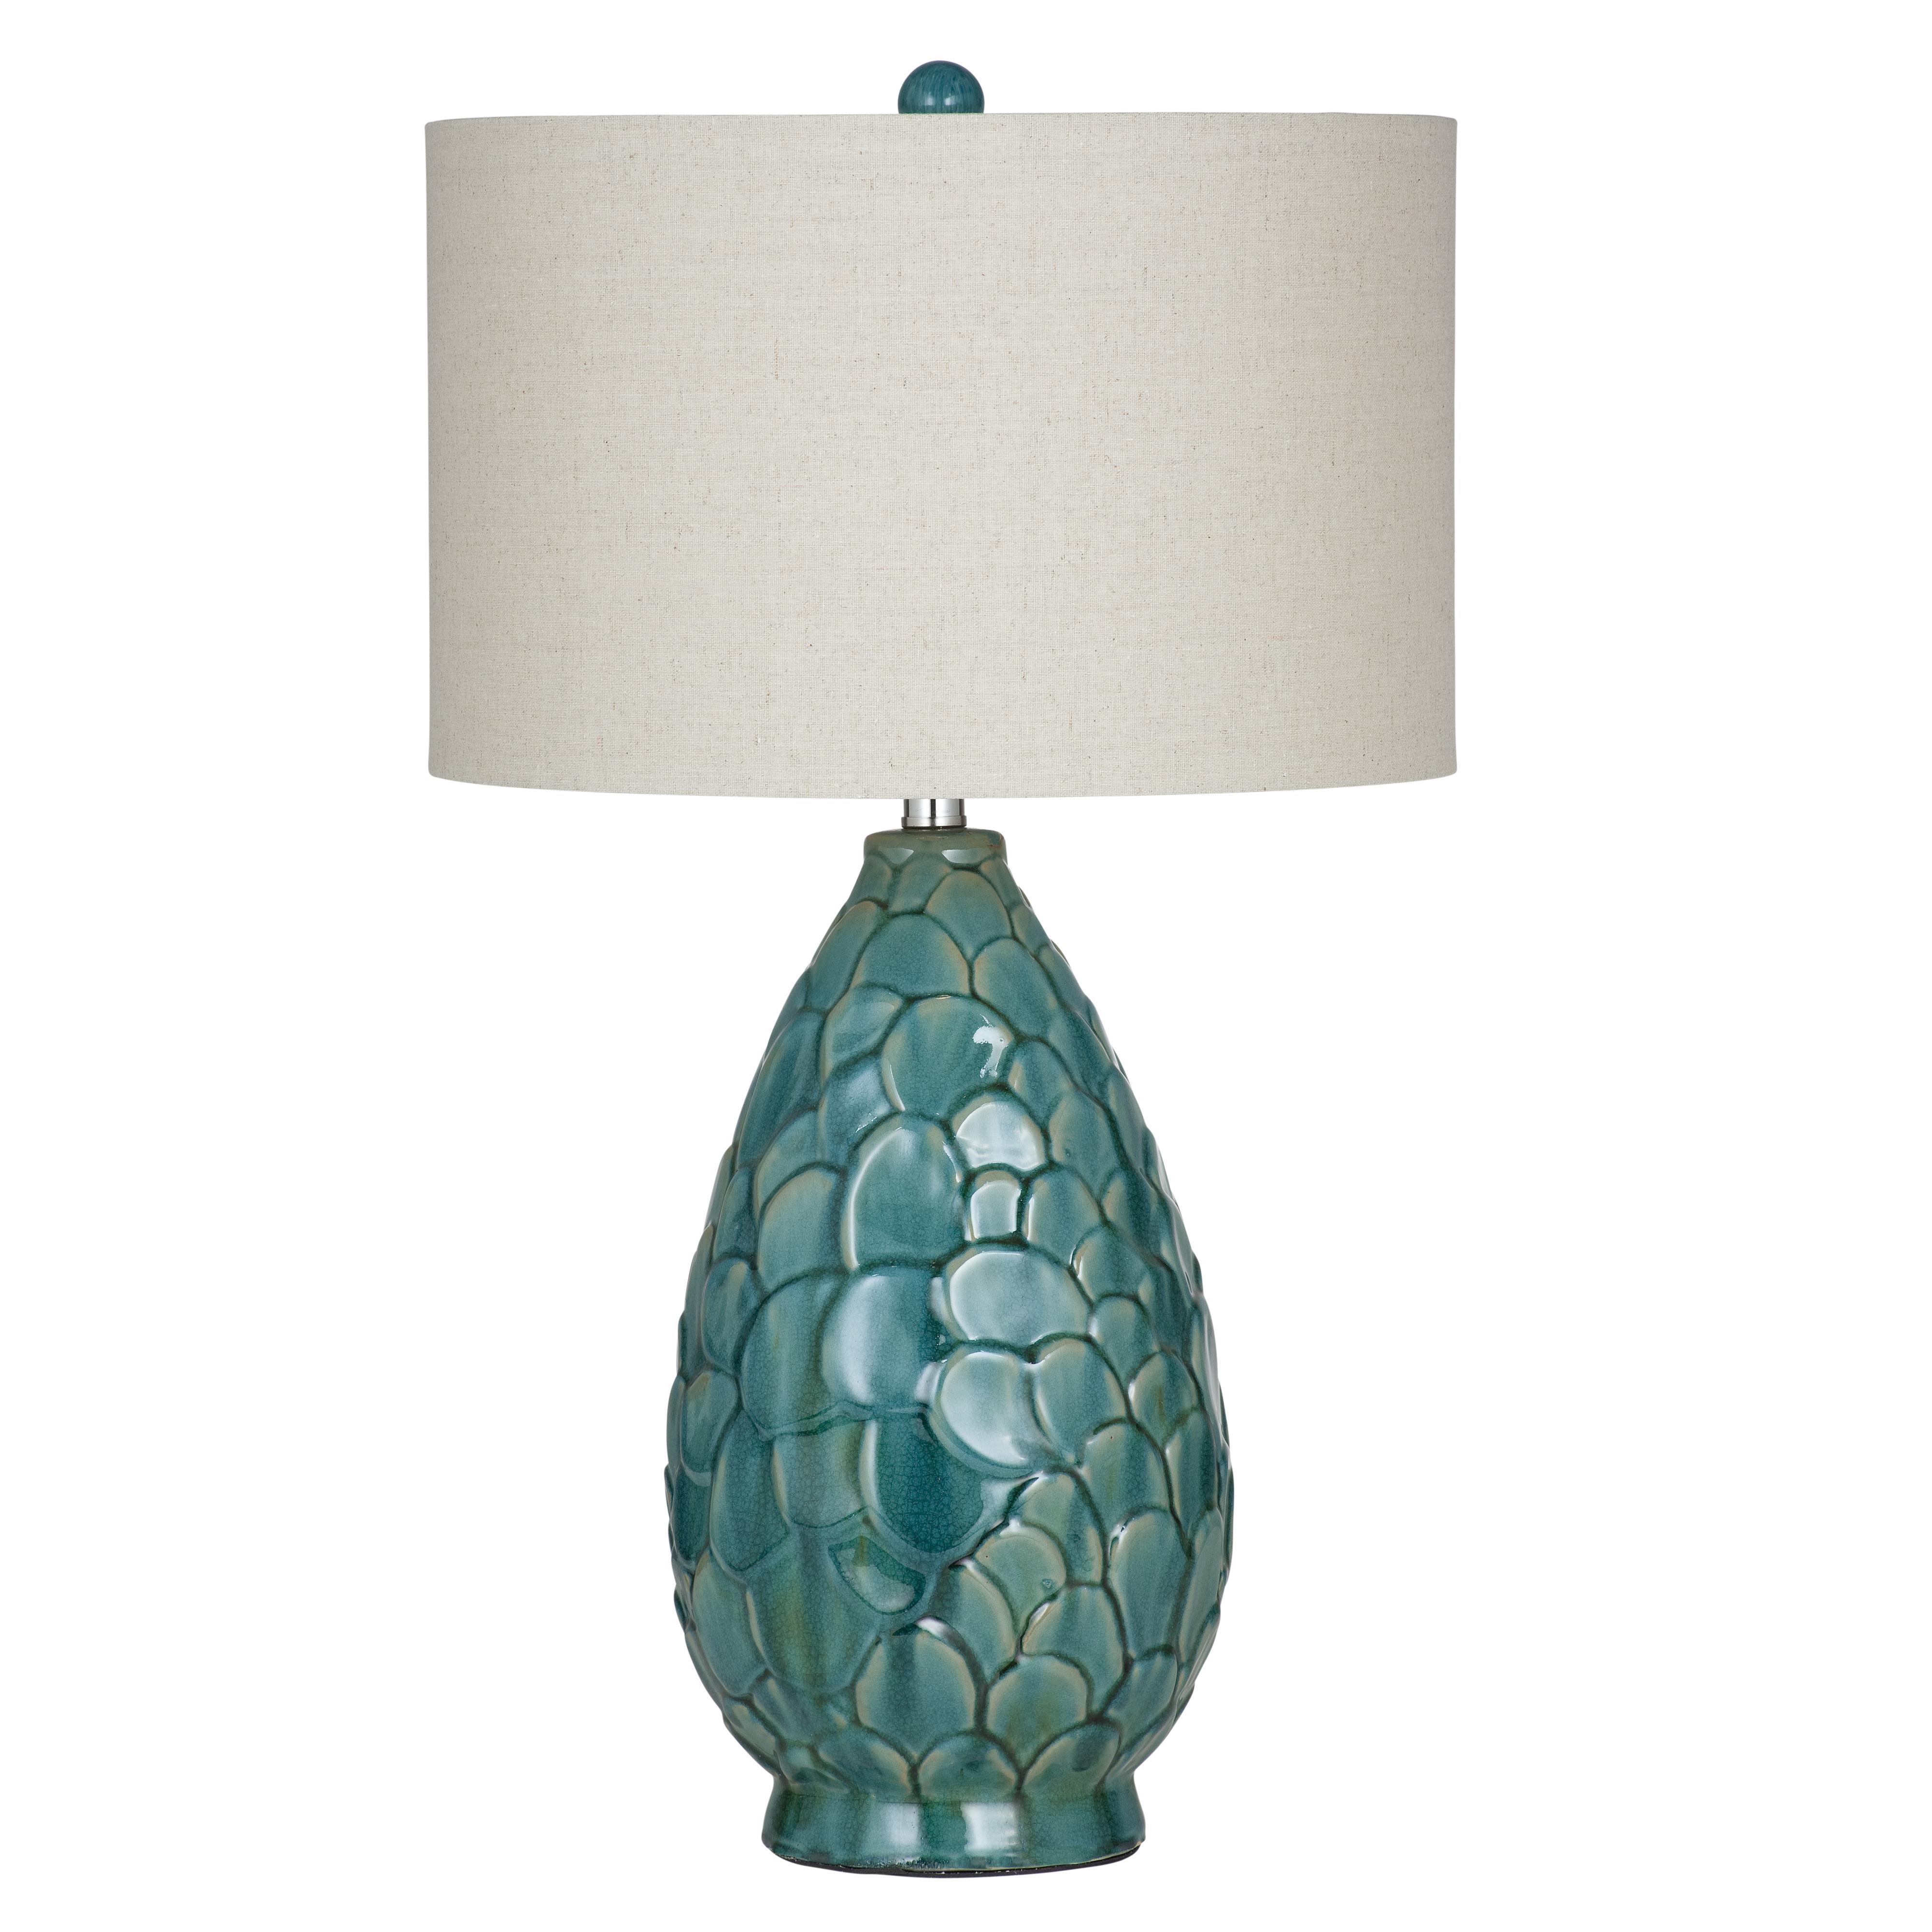 Sorento Table Lamp